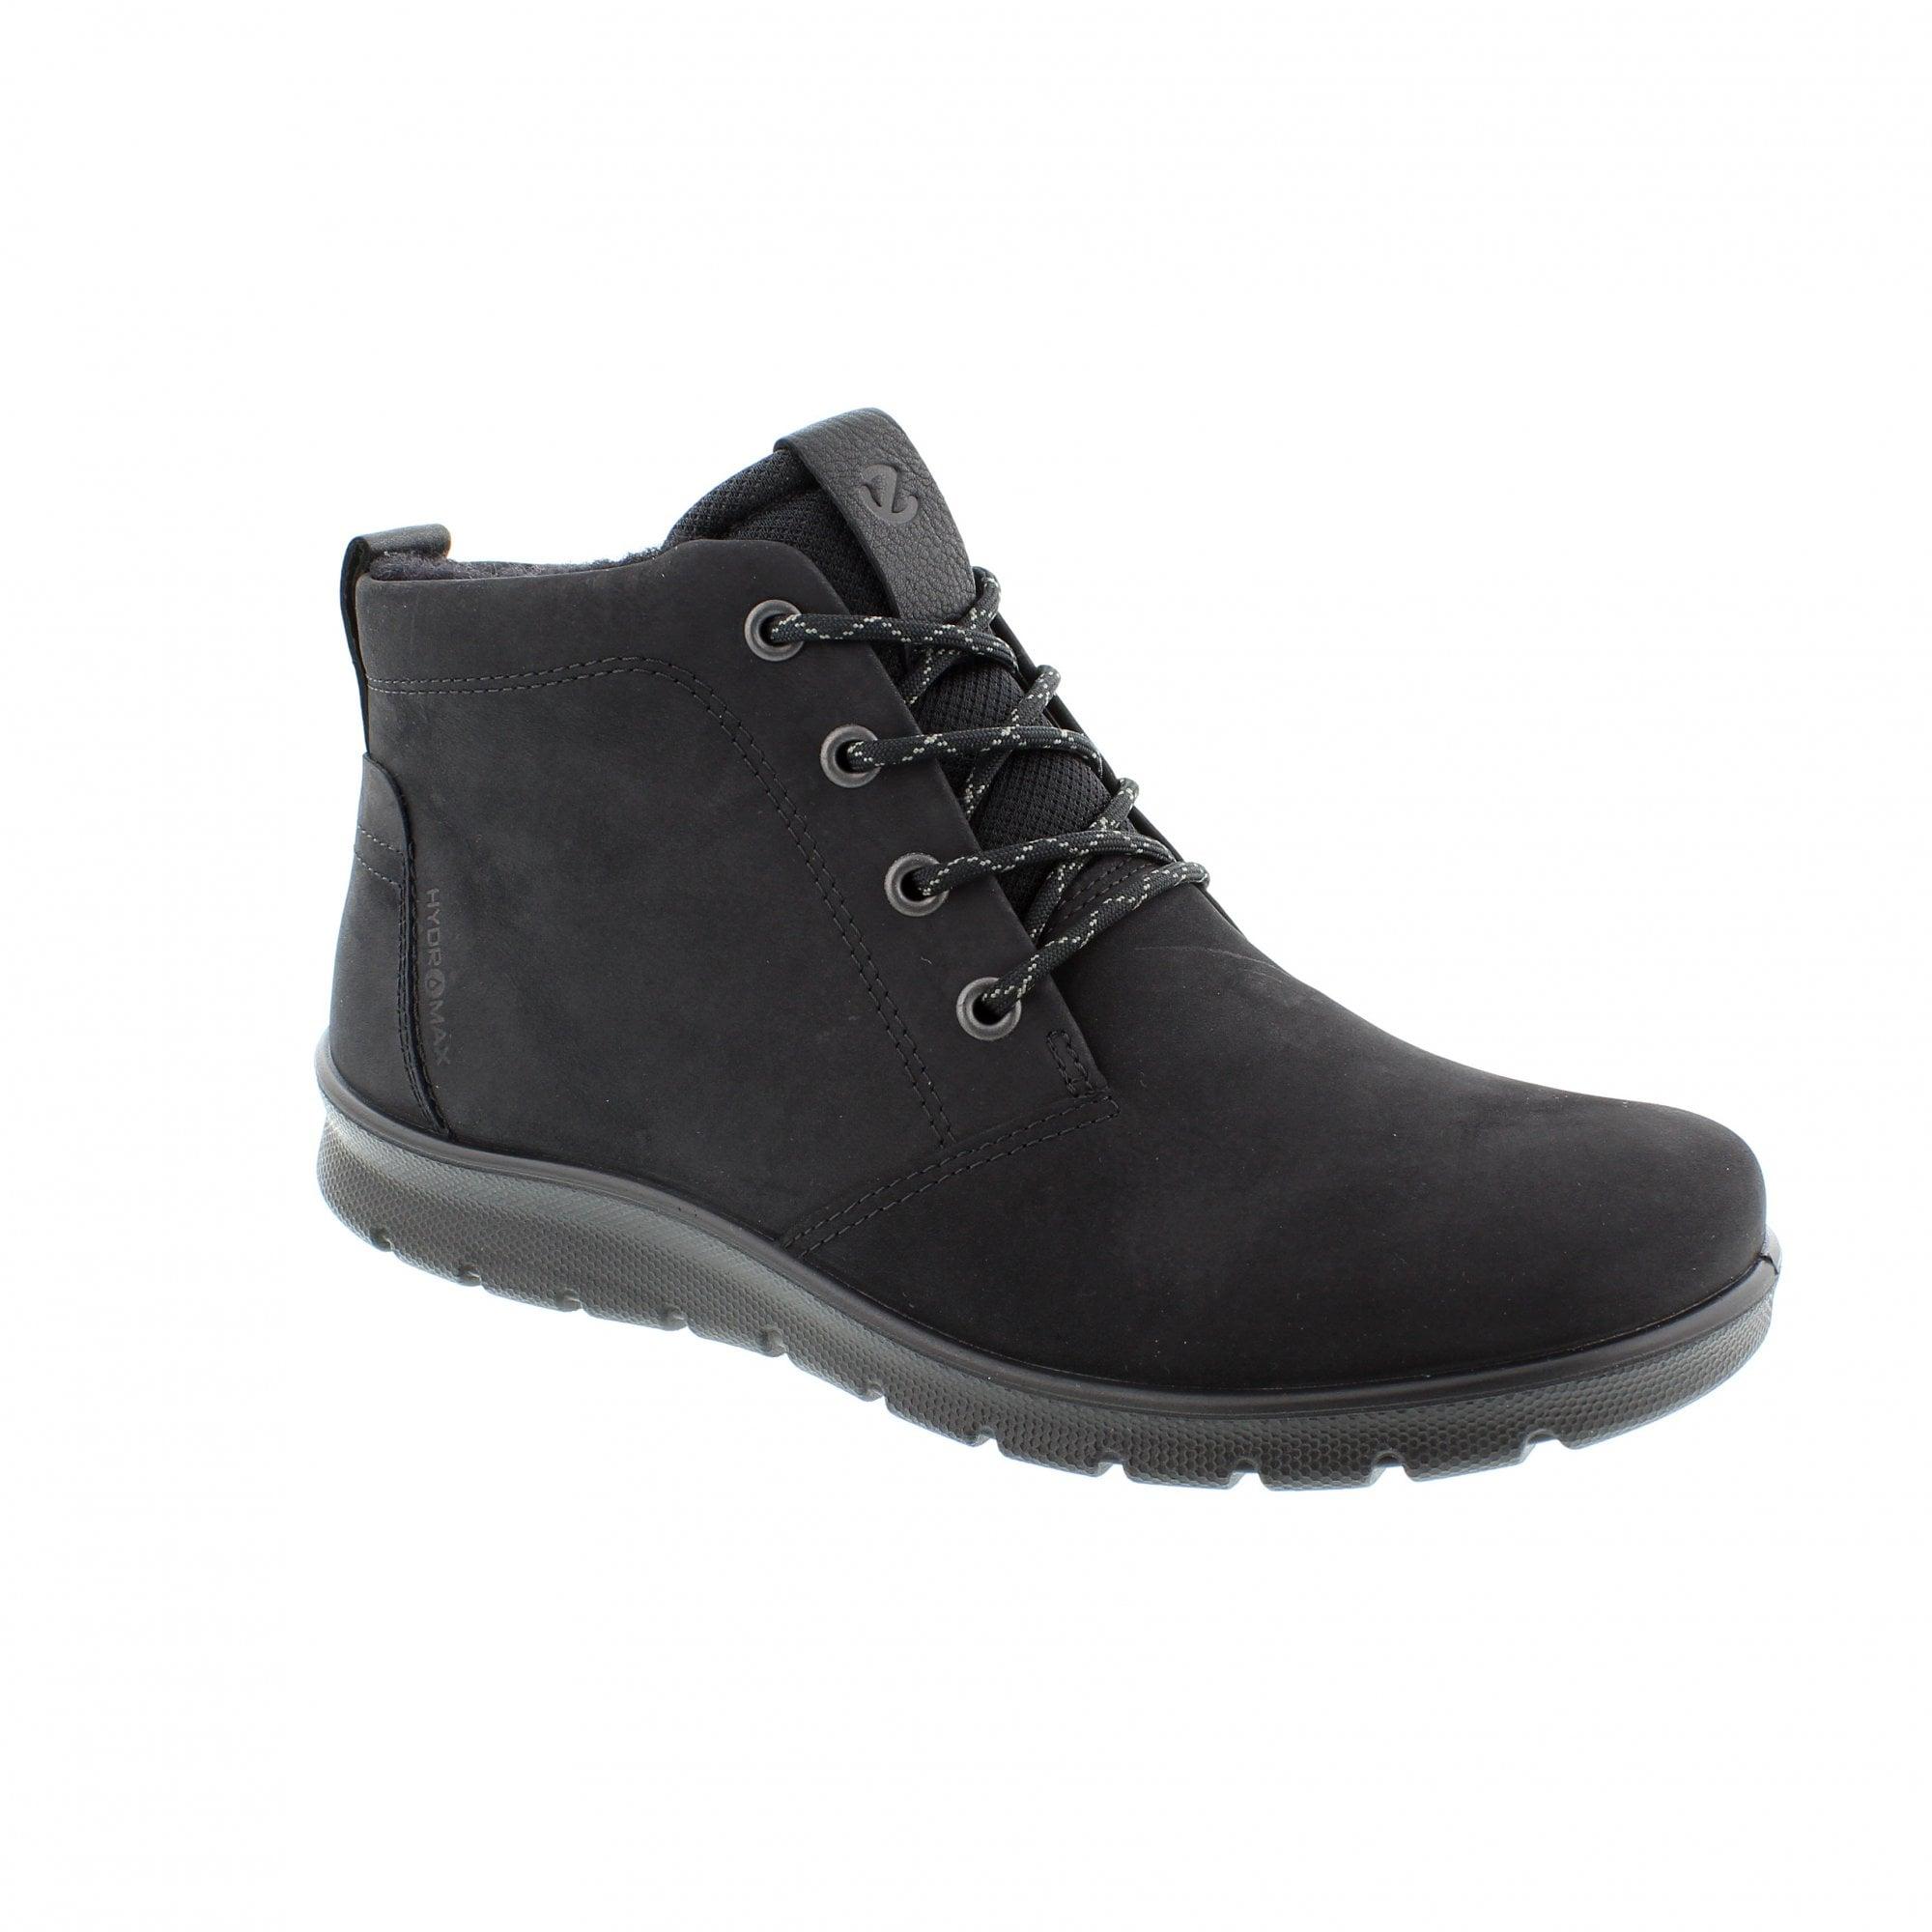 579dcfd852508 Ecco Babett 215613-12001 Womens Ankle Boots | Rogerson Shoes